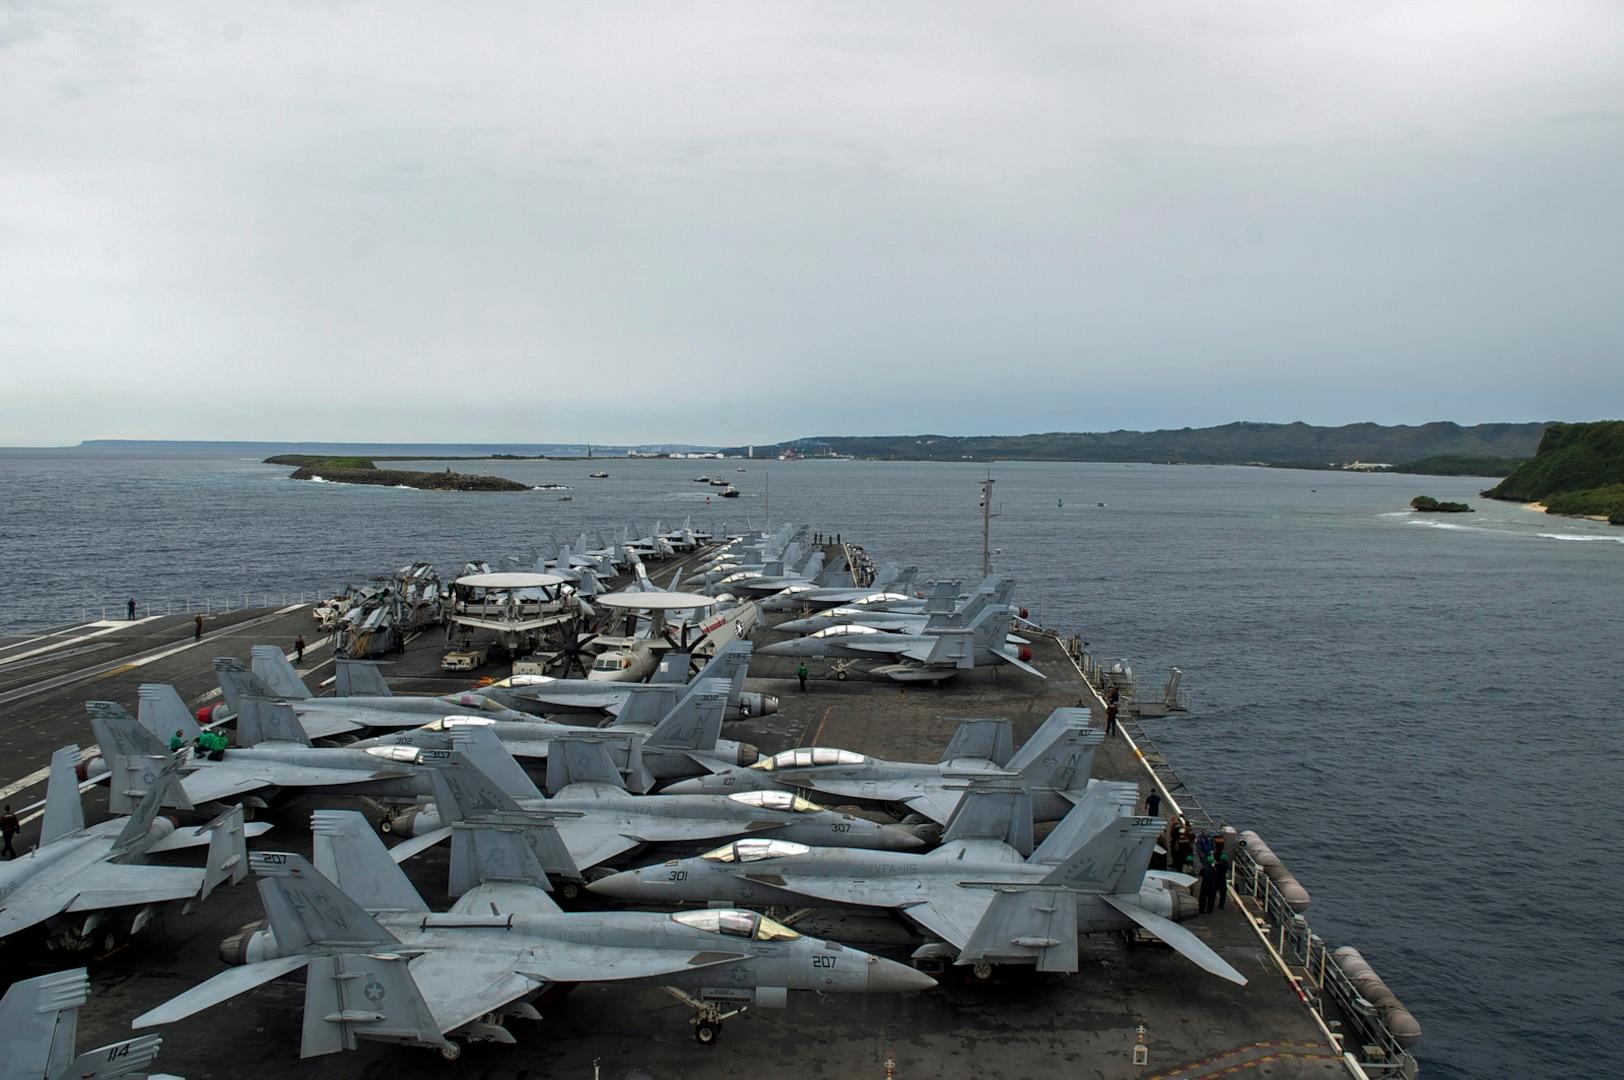 Ronald Reagan Strike Group Arrives in Guam following Valiant Shield 2018